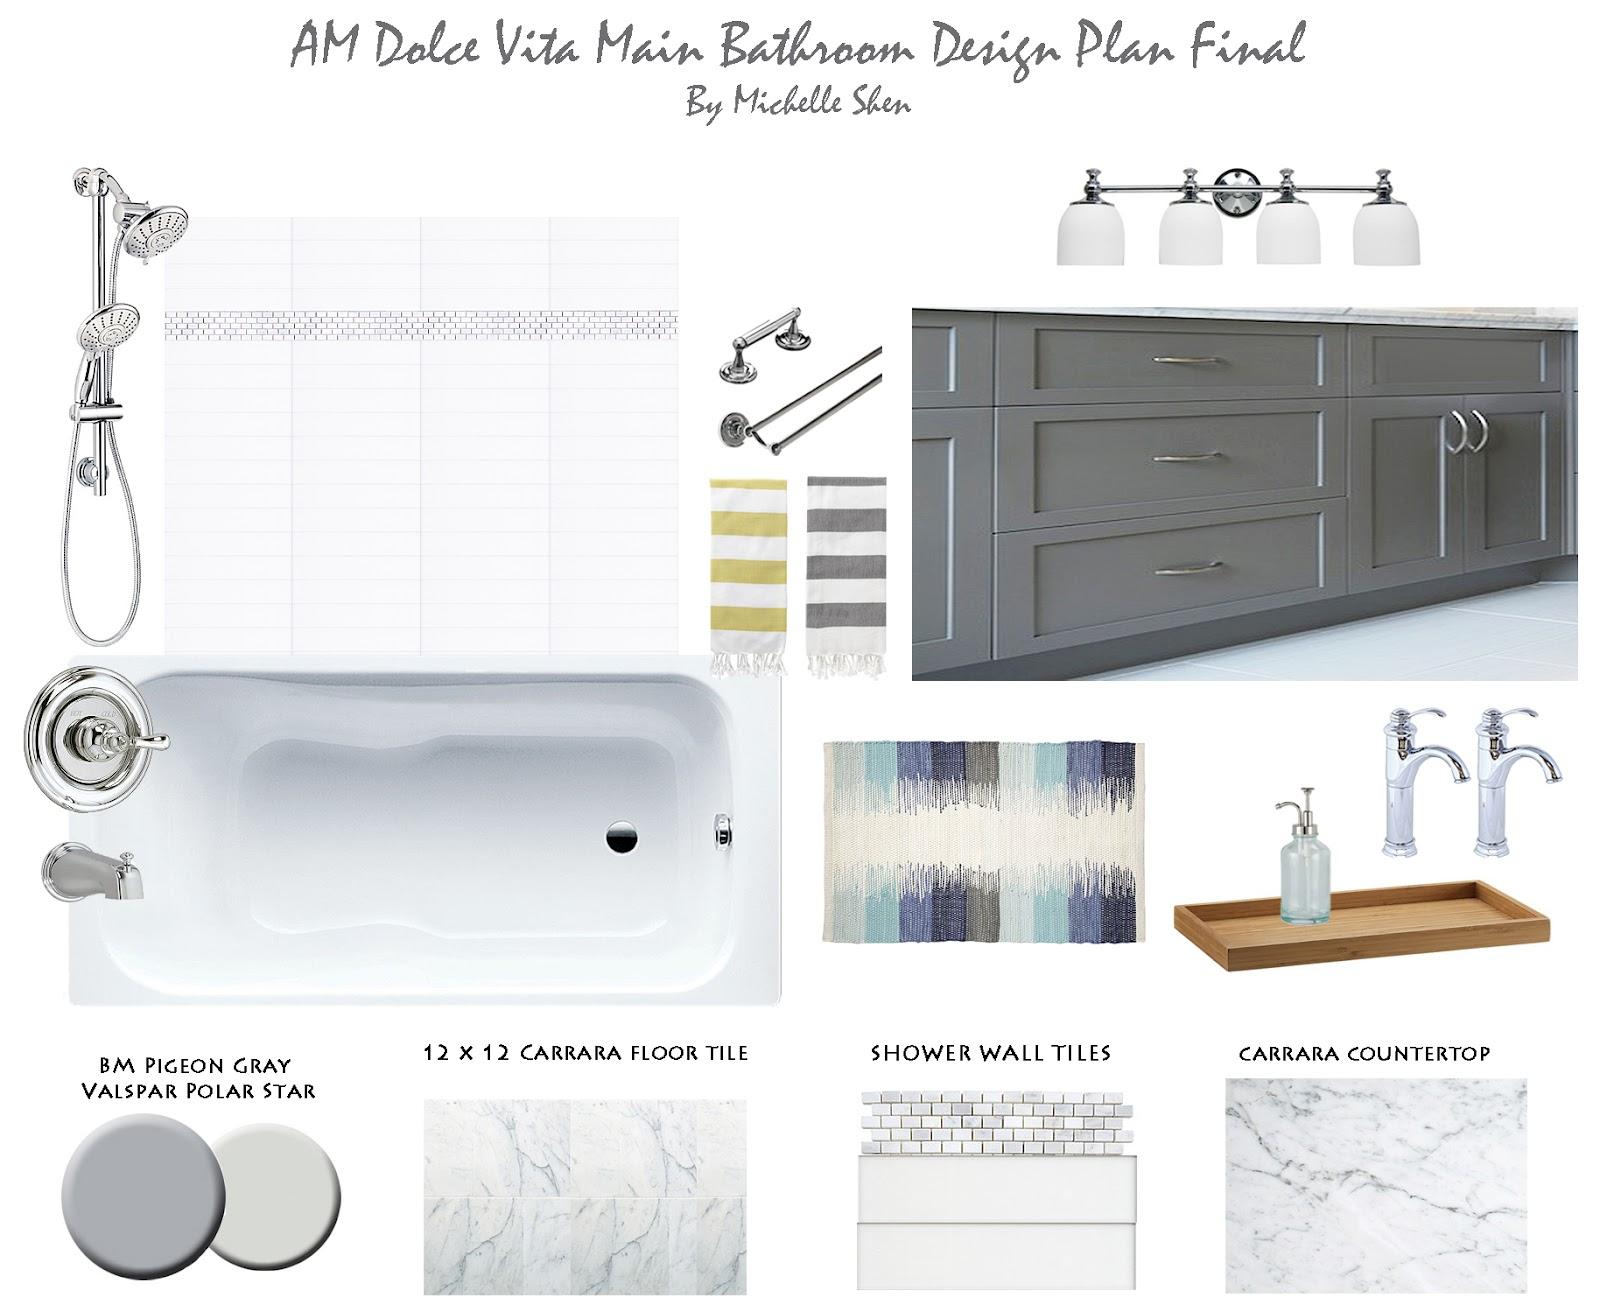 Target Bathroom Sconces am dolce vita: bathroom reno on a budget